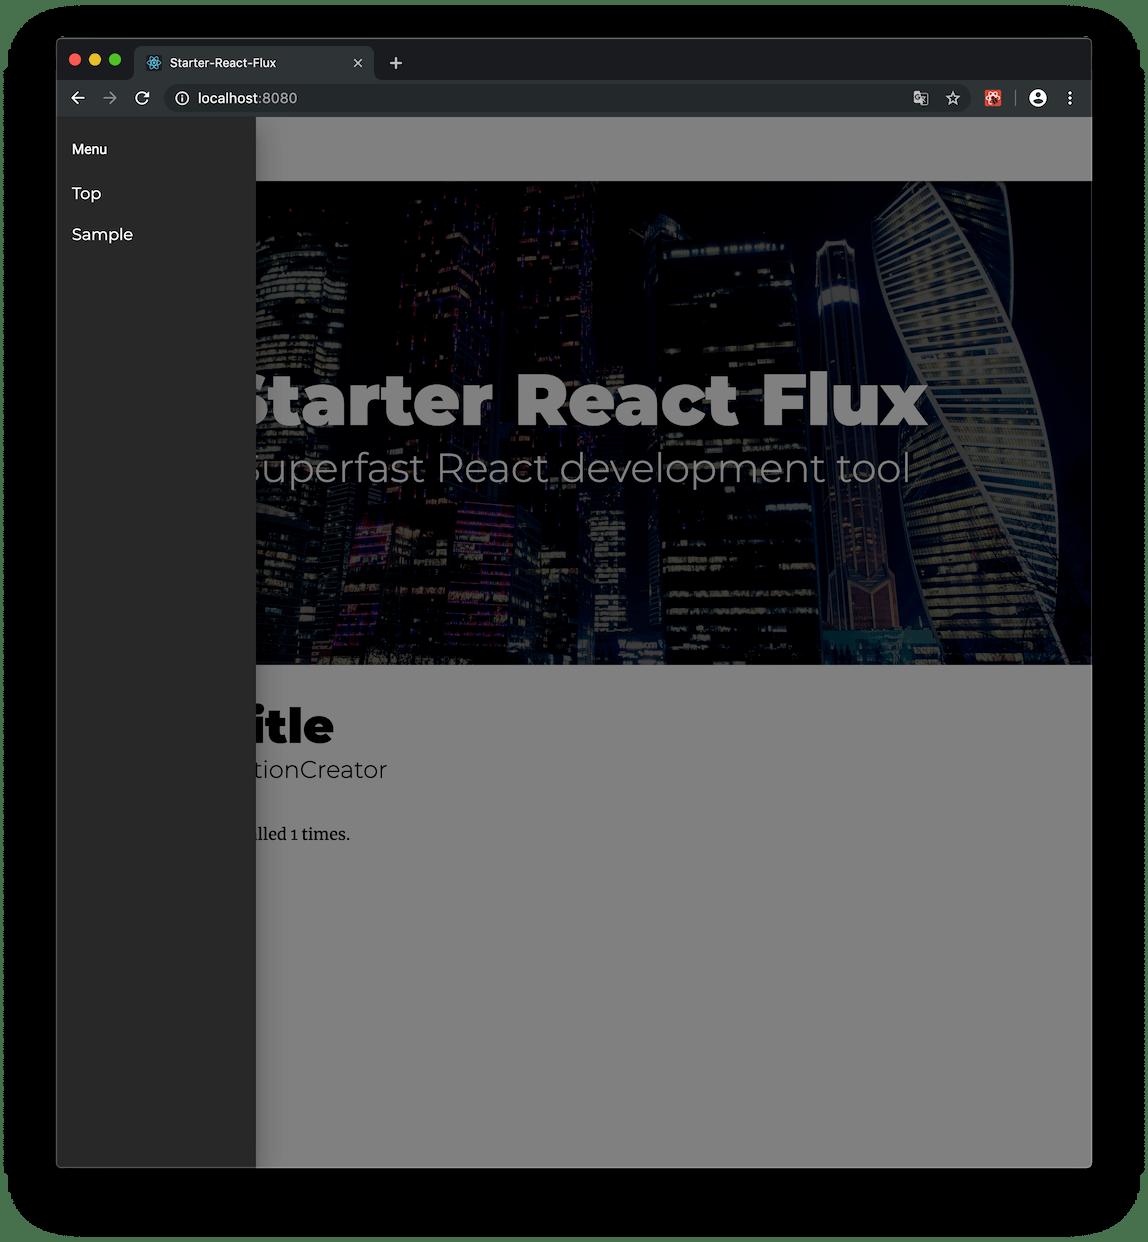 starter-react-flux - npm